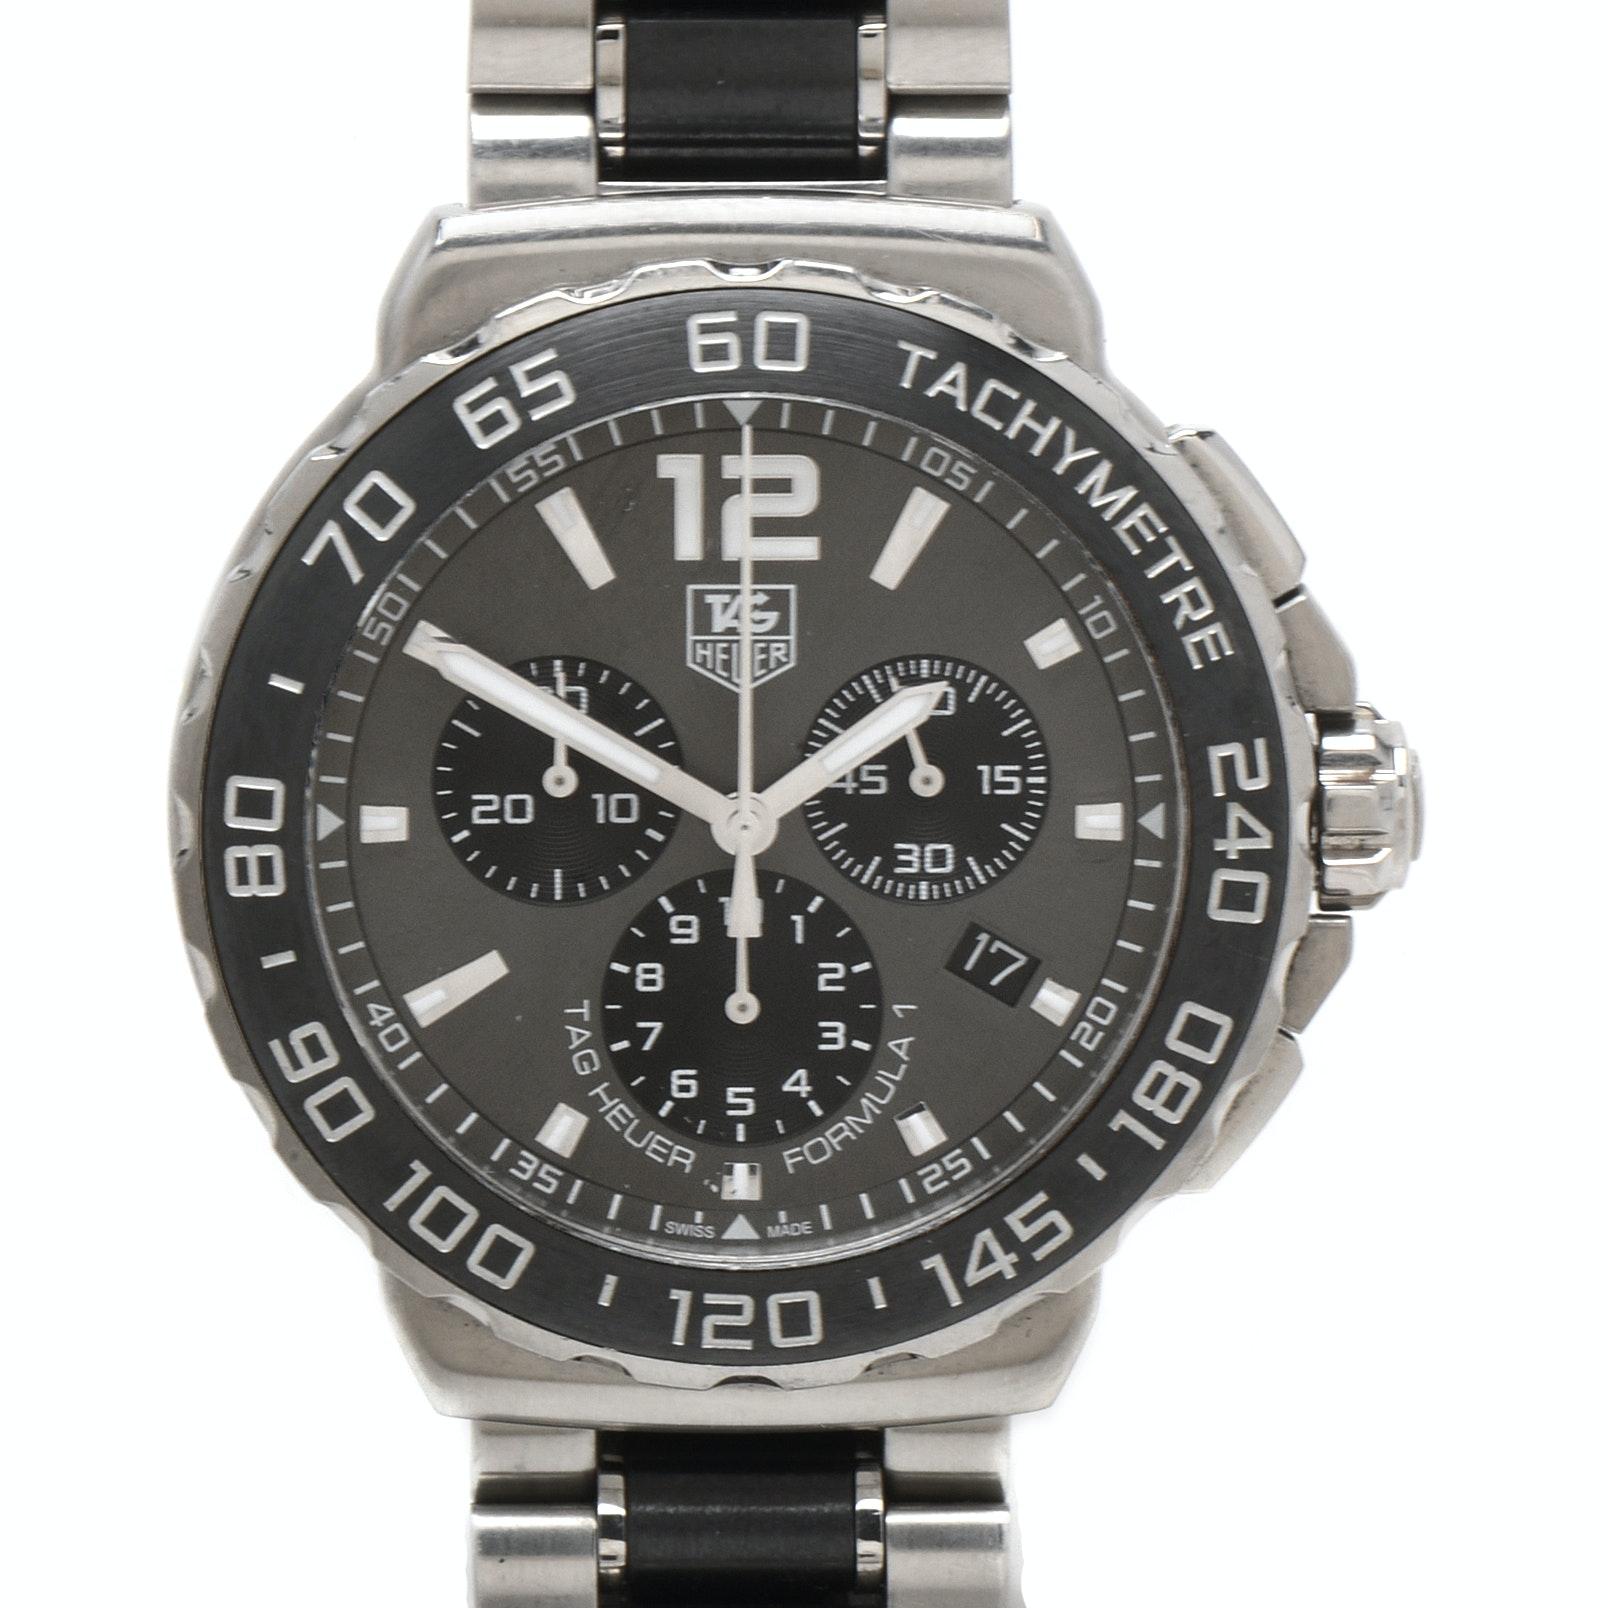 TAG Heuer Formula 1 Chronograph Ceramic and Steel Anthracite Quartz Wristwatch